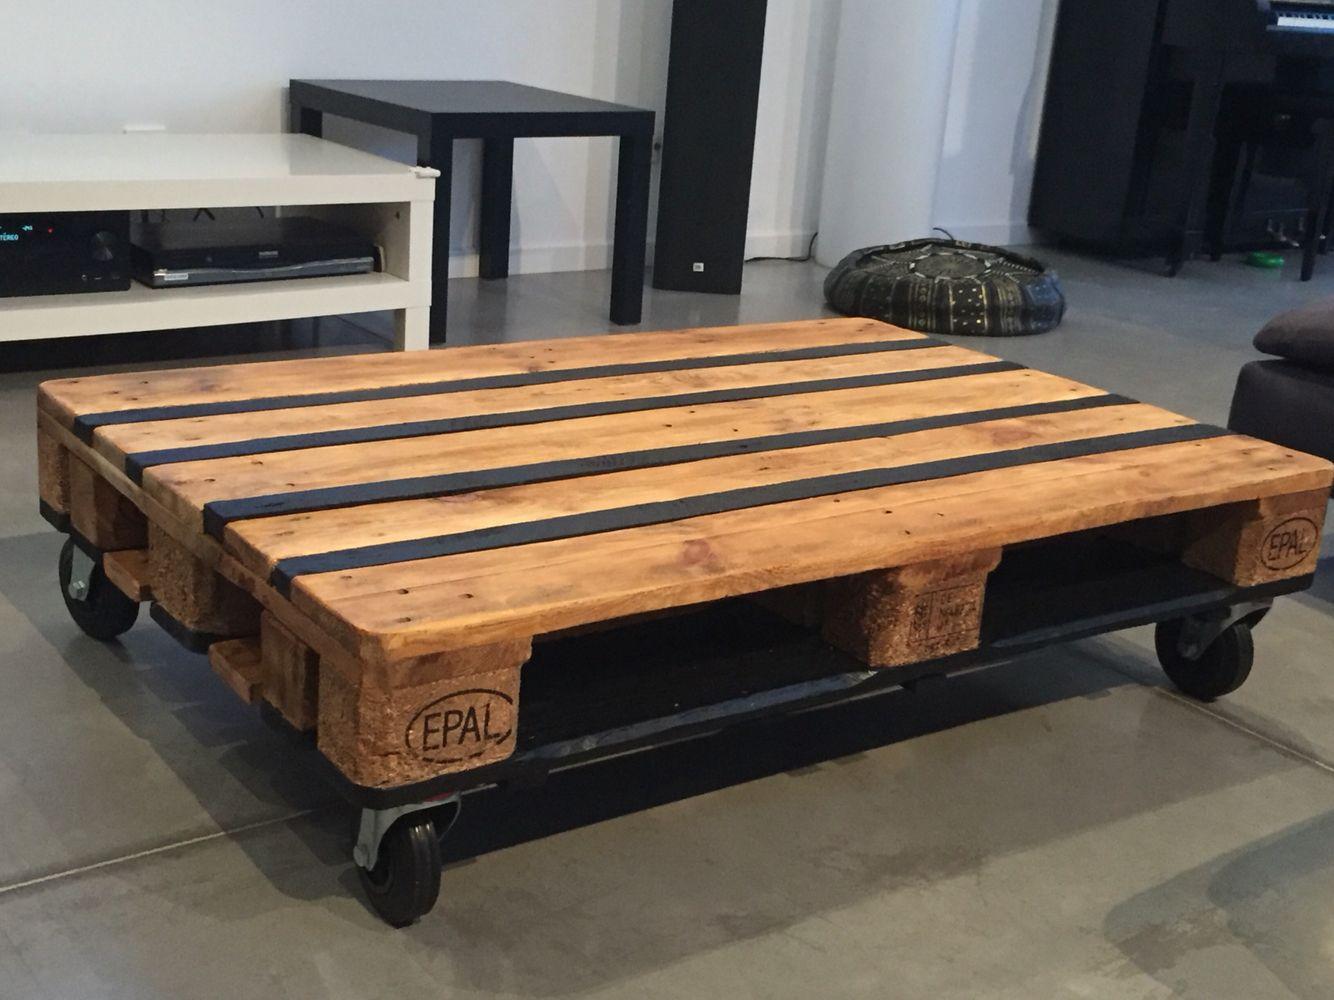 Table Basse En Palette D Apres Tuto Leroy Merlin Table Basse